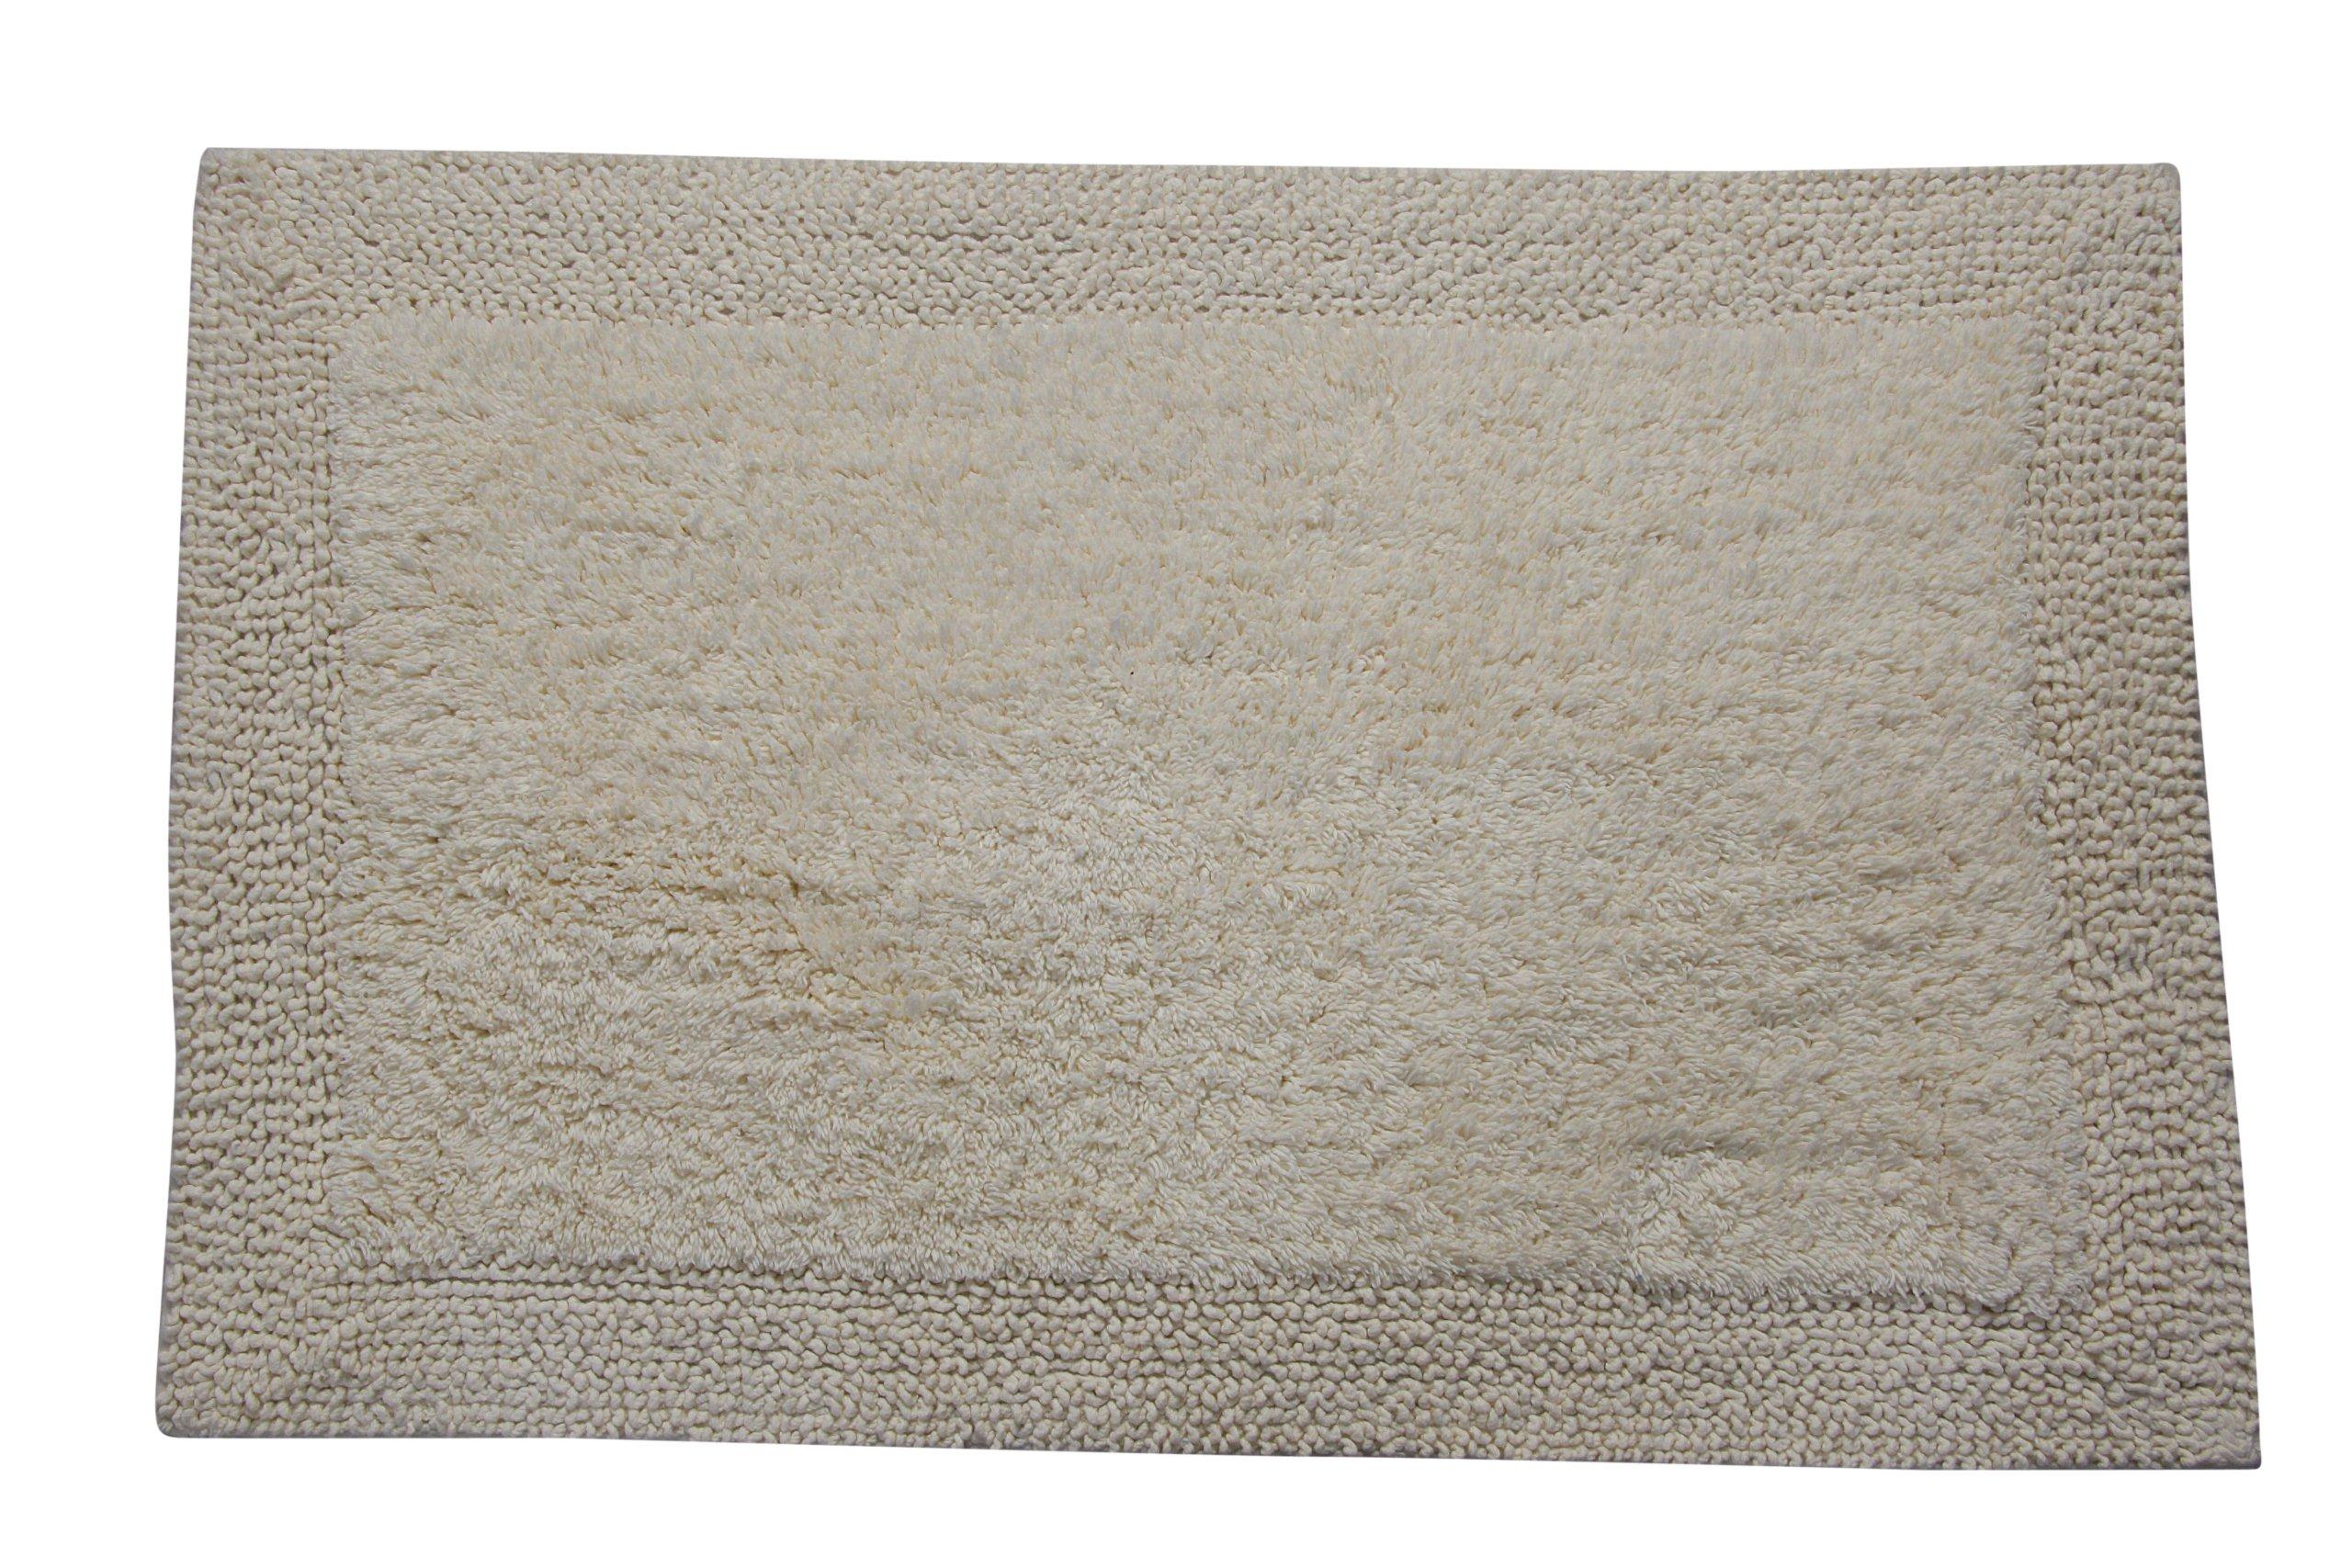 Castle Hill Bella Napoli 100% Cotton Reversible Bath Rug 20X30 Ivory - Super soft absorbent bath rug Reversible bath mat Easy care machine washable - bathroom-linens, bathroom, bath-mats - 91W38kHBA3L -